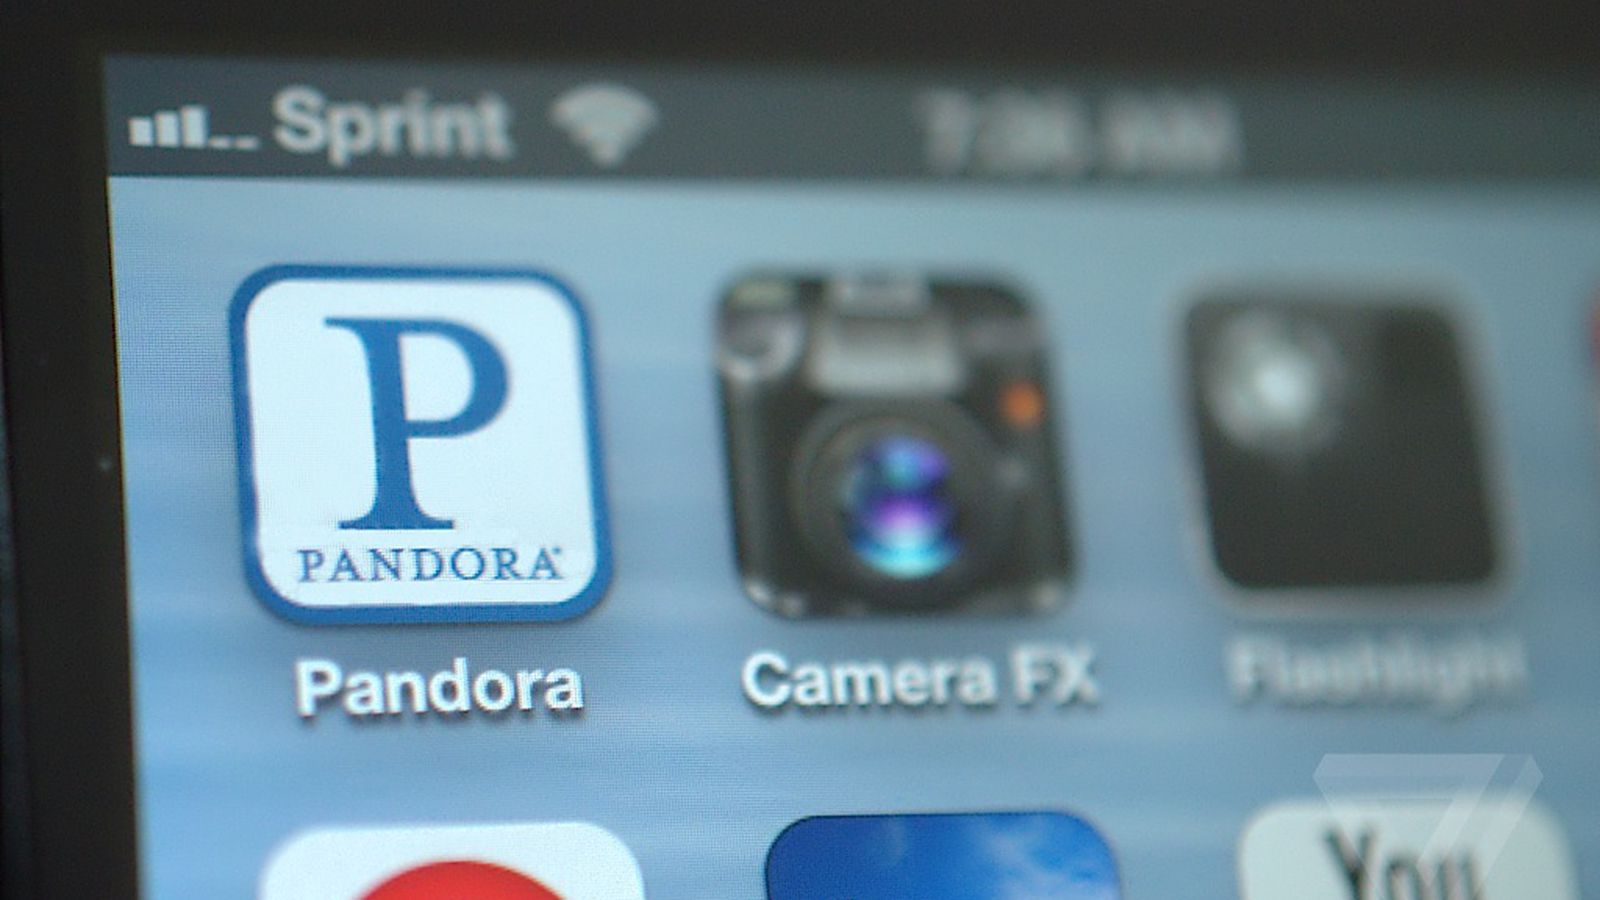 Pandora Raises Fees And Drops Annual Subscriptions Citing